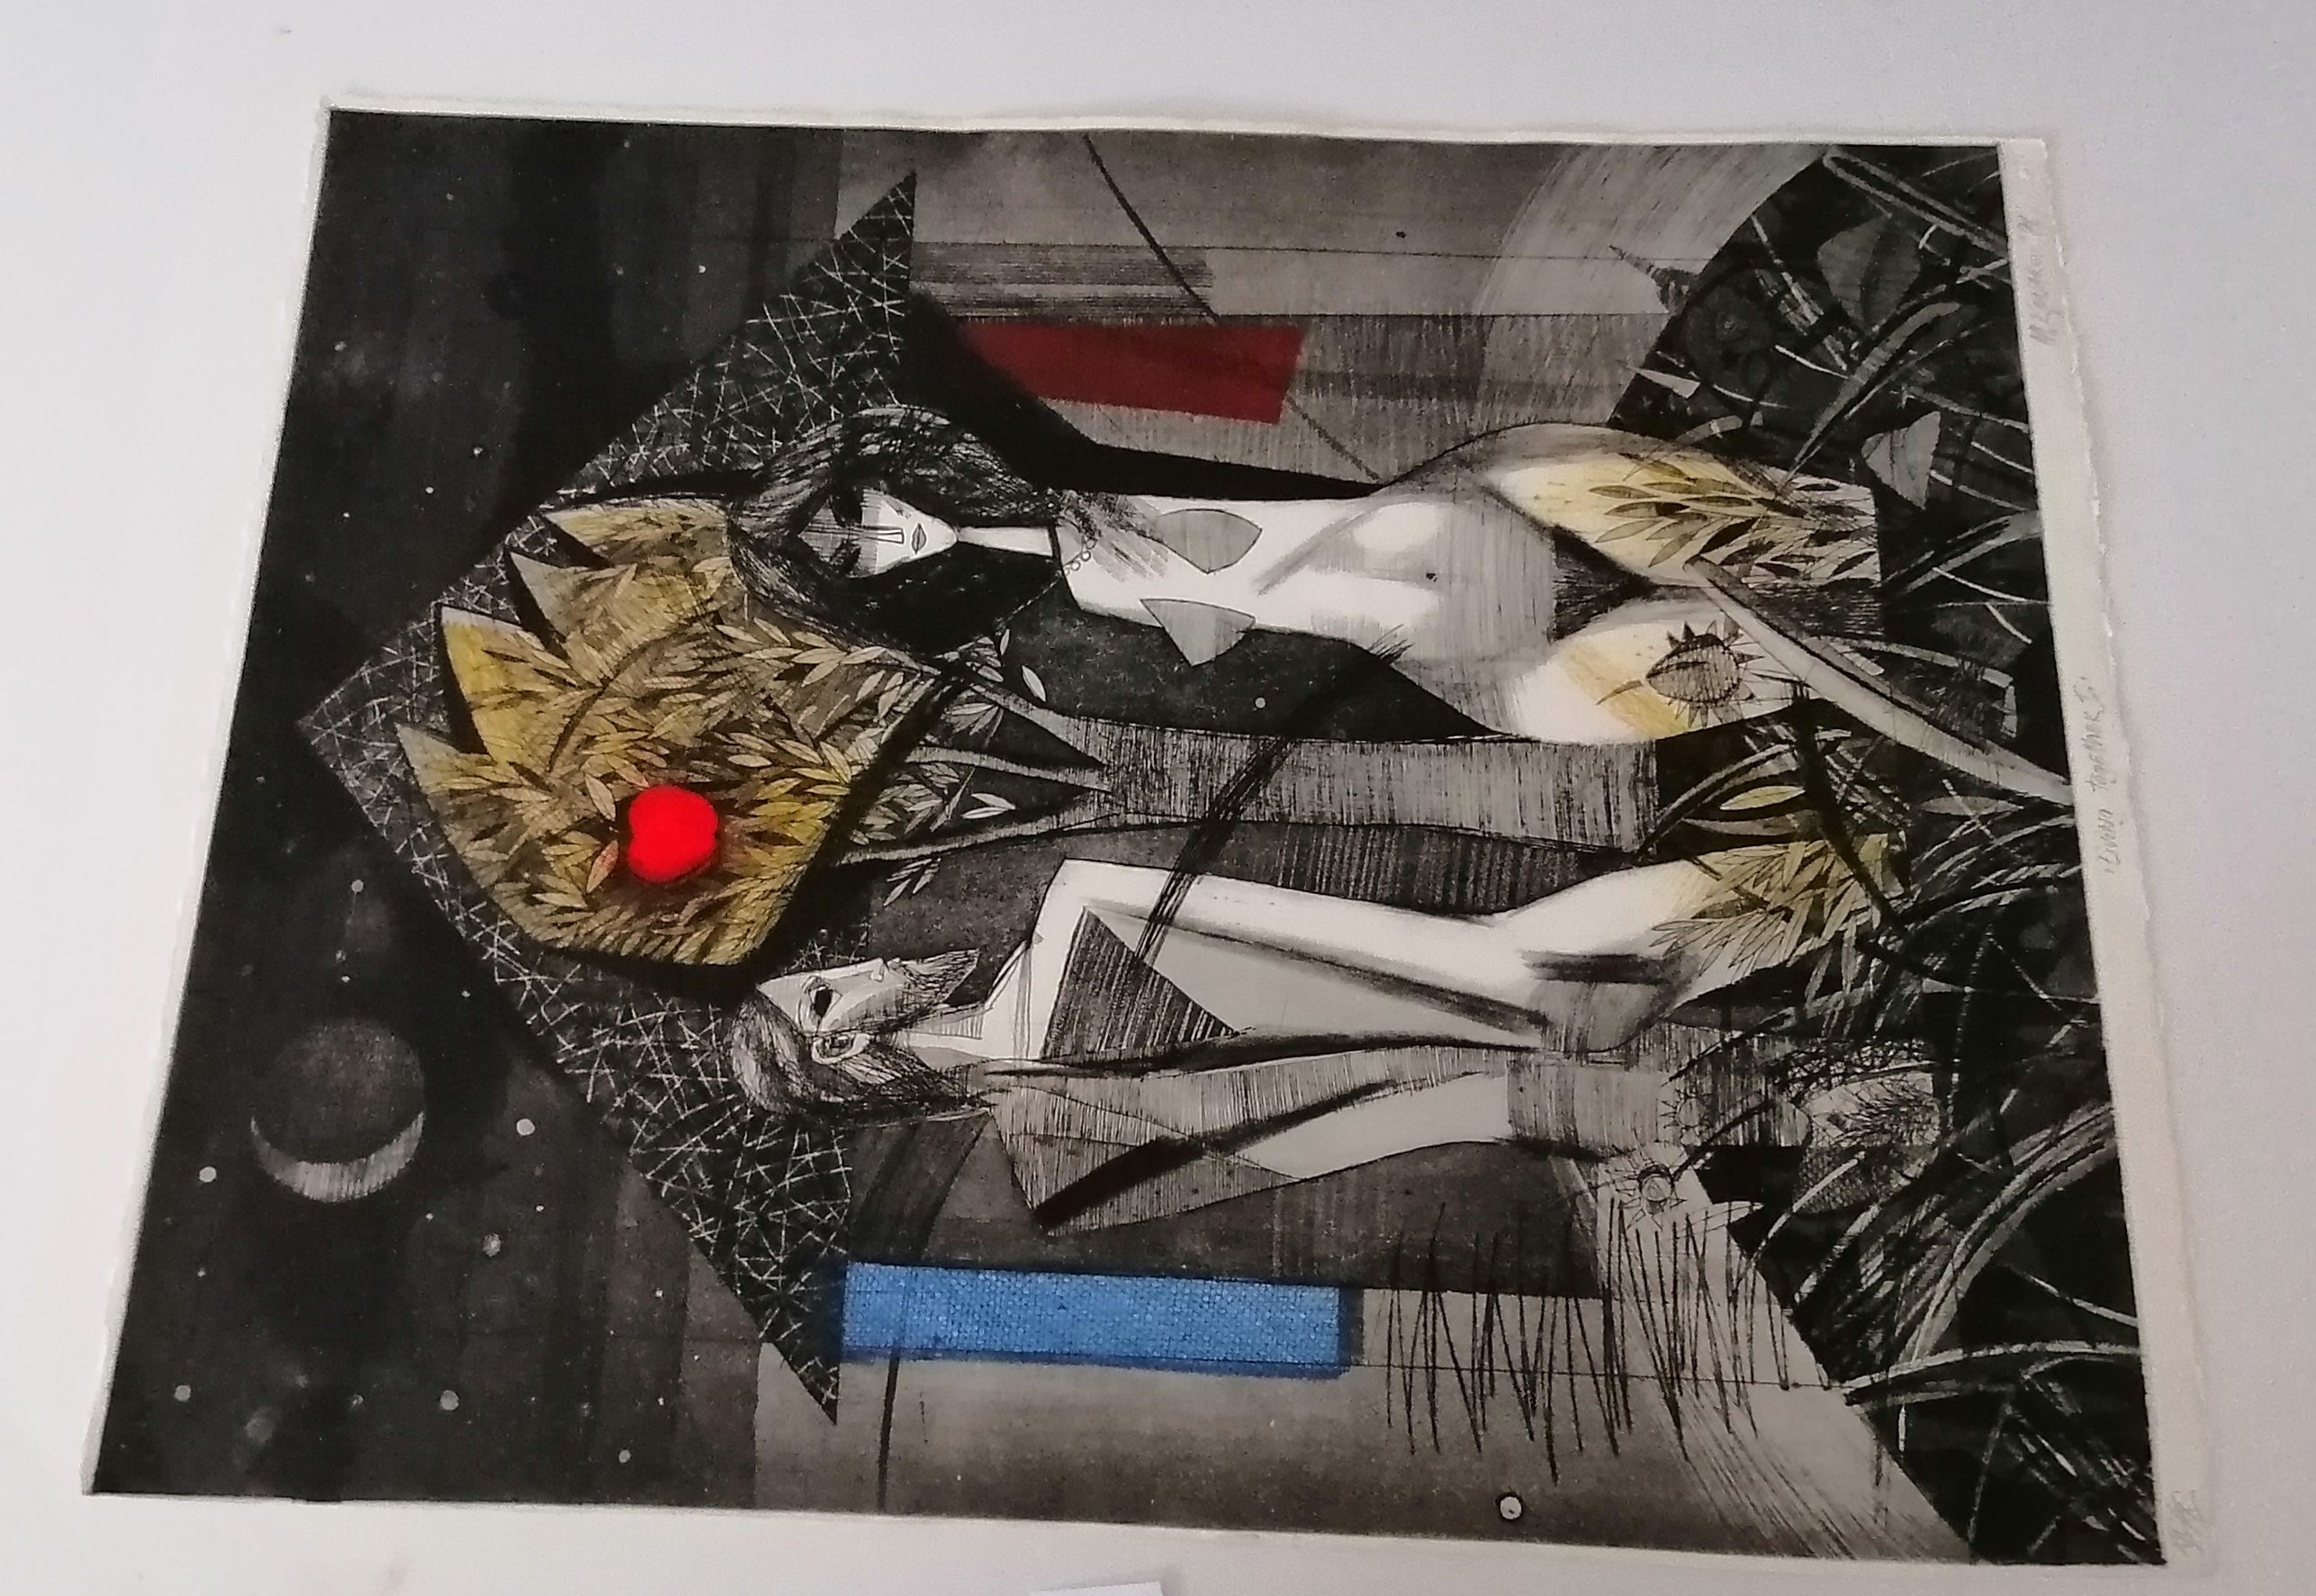 https://www.norstamps.com/content/images/stamps/gtgallerier/188.jpg